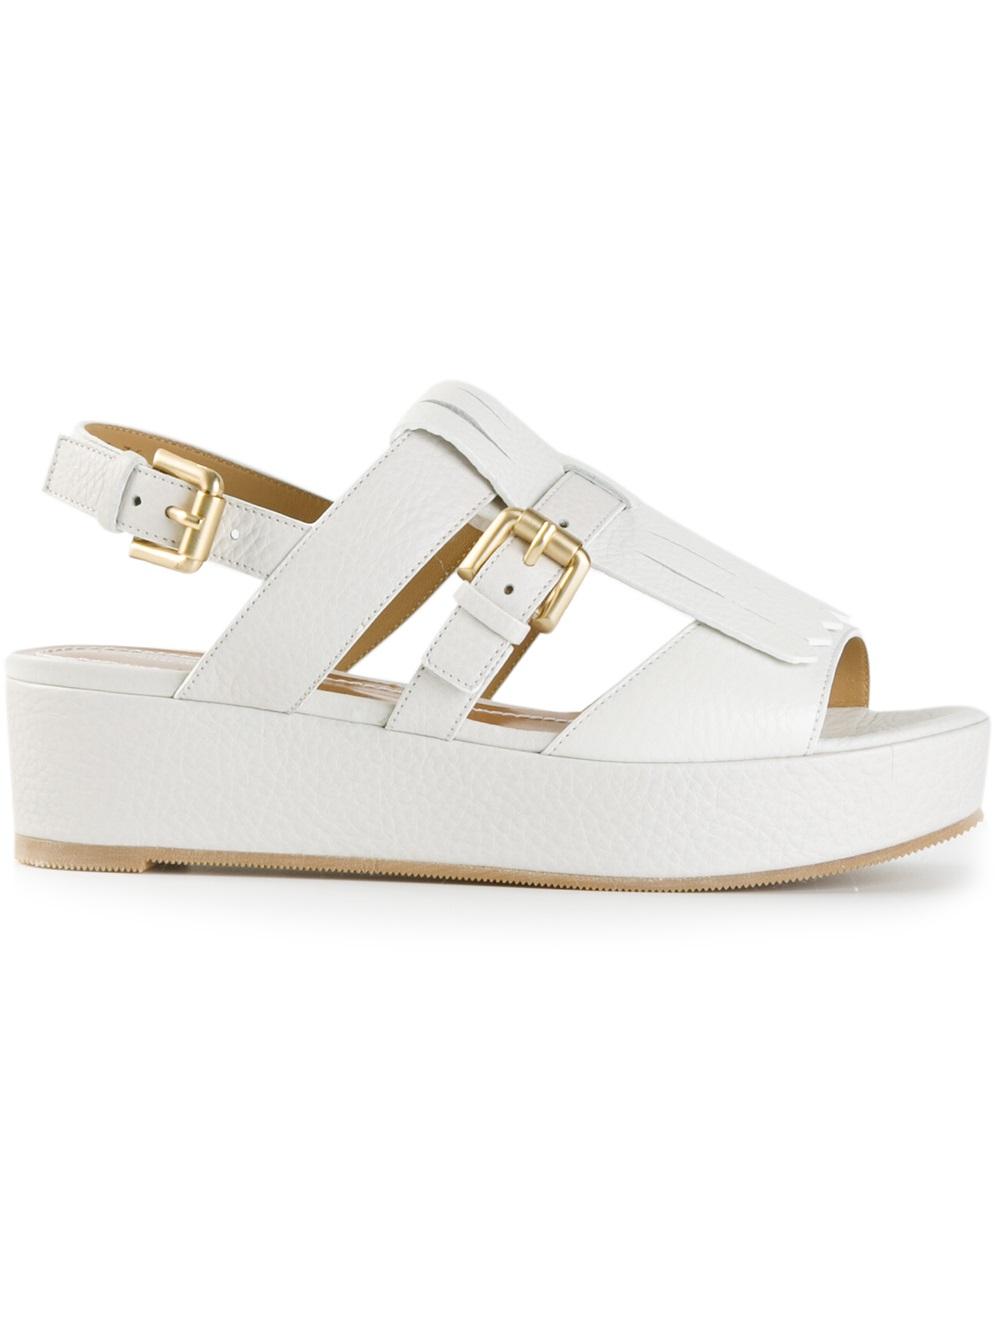 platform sandals - White Santoni wRHACIP